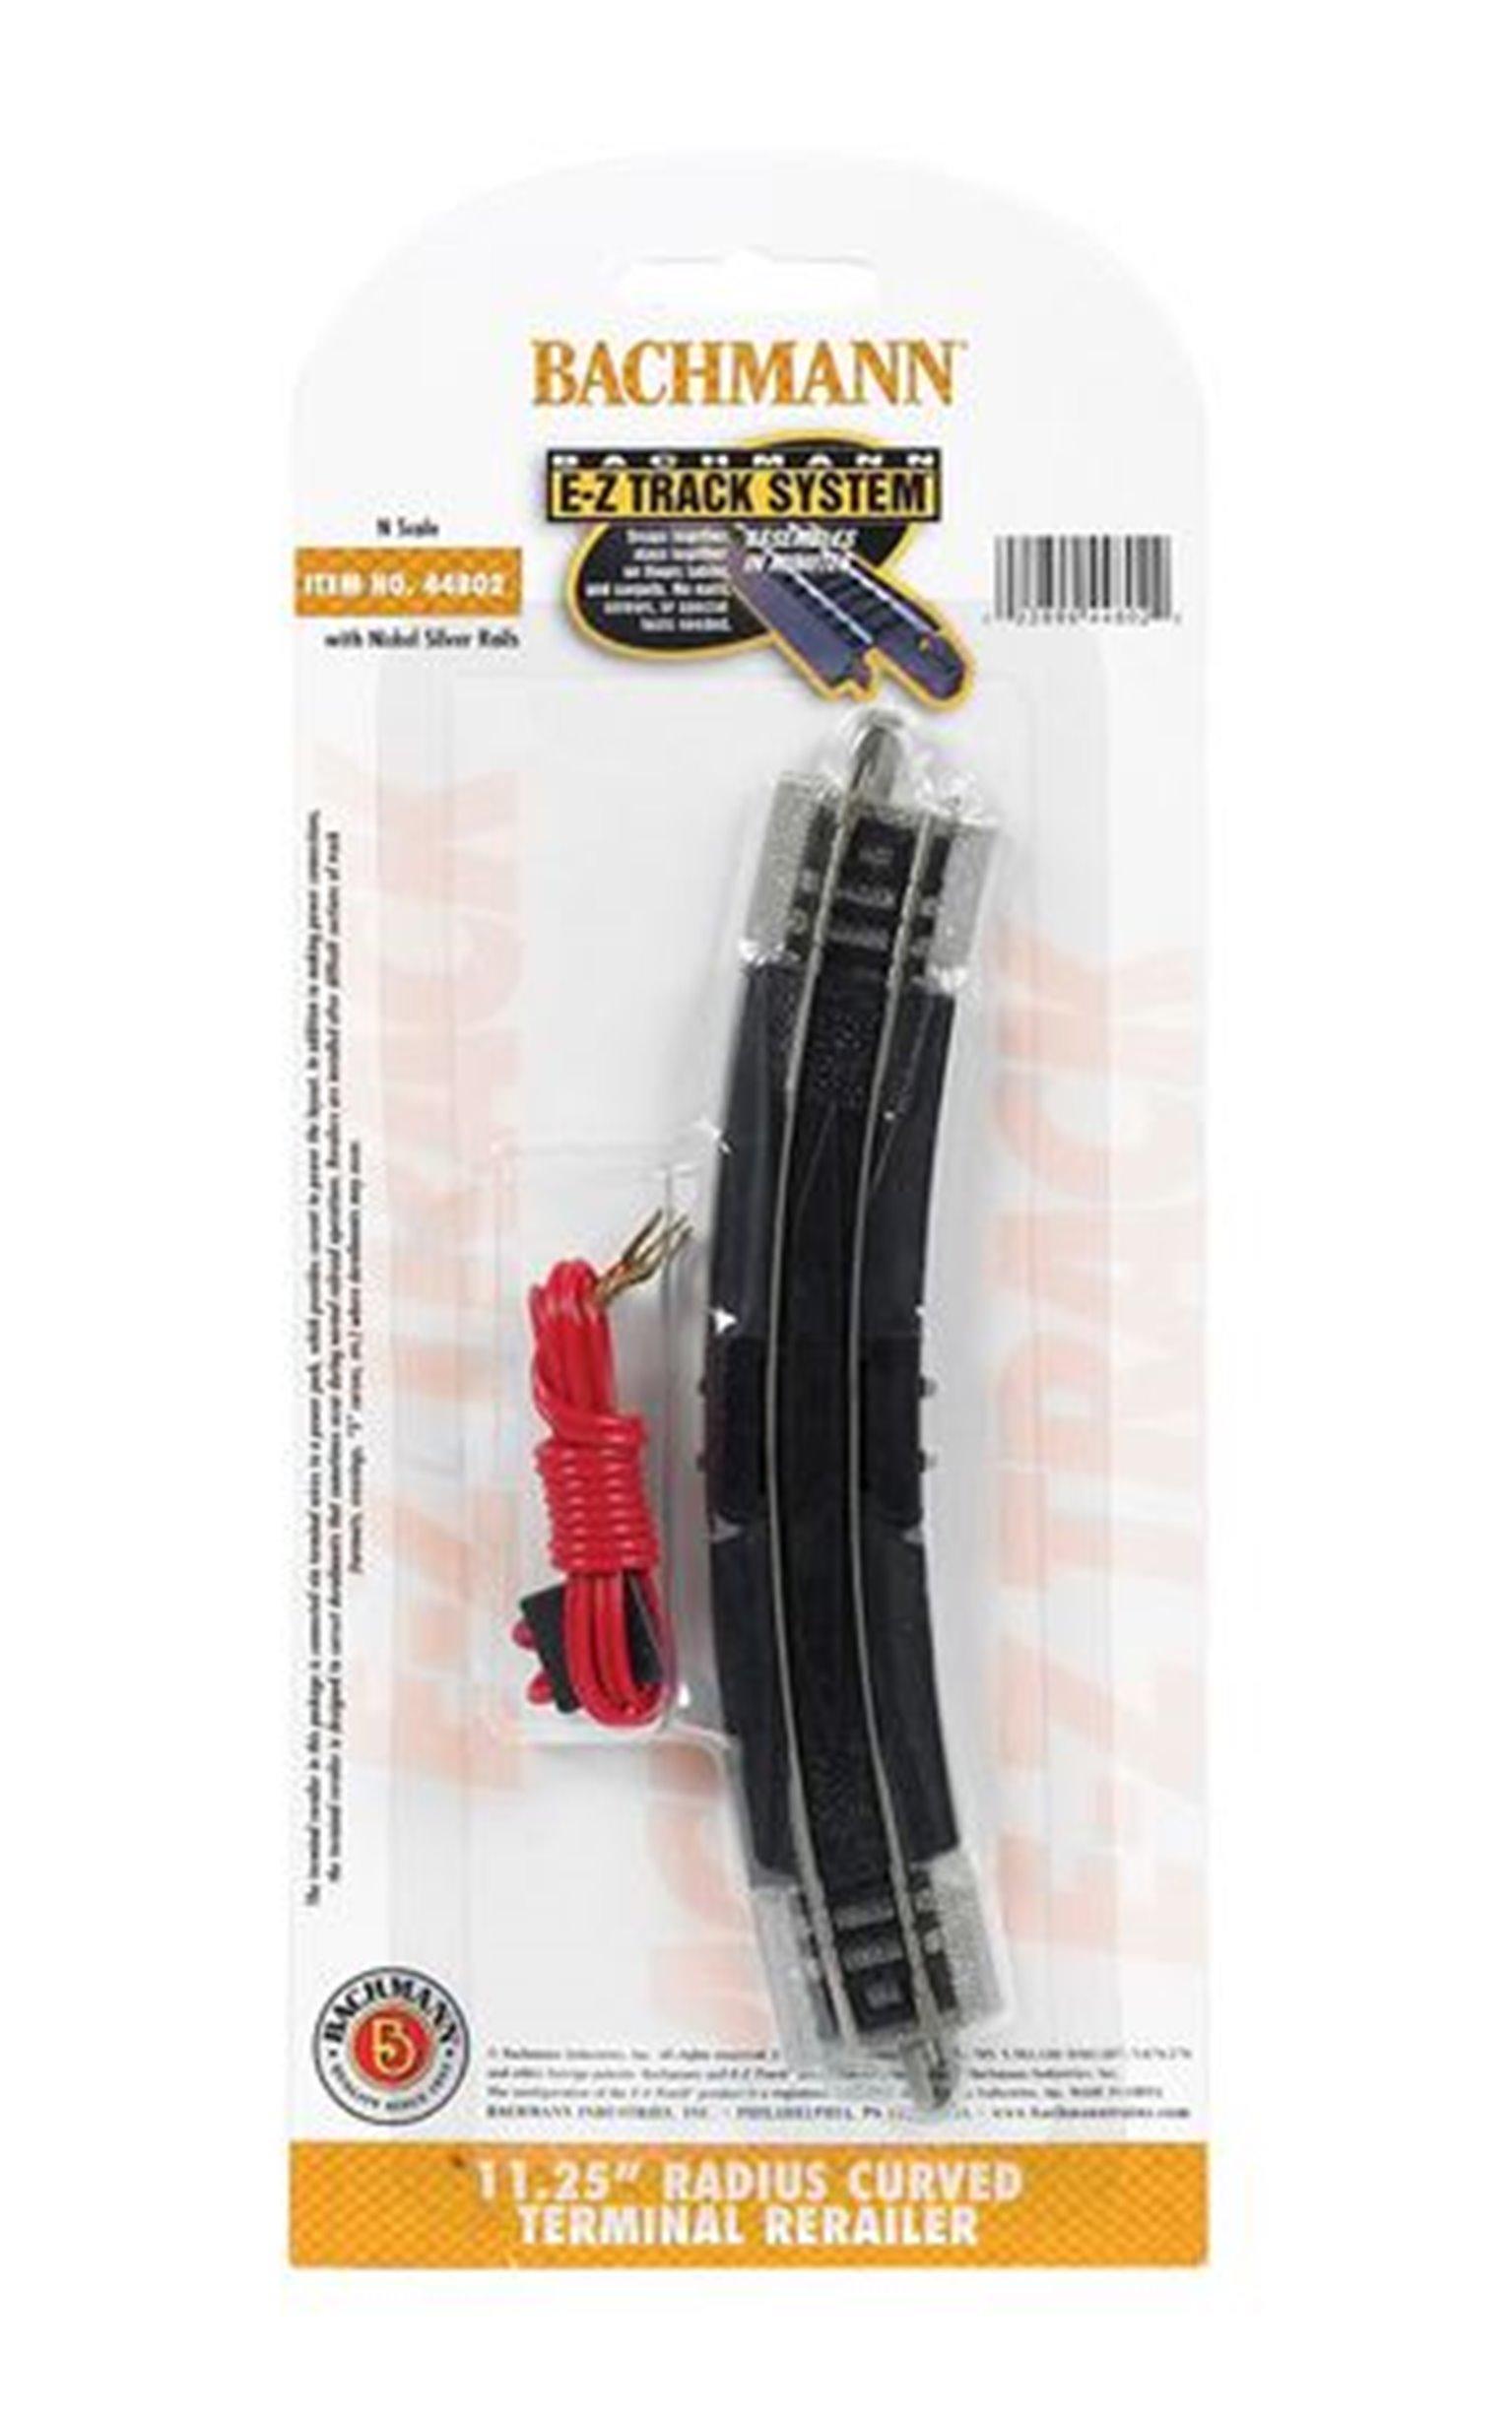 Bachmann E-Z Track 44802 11¼ Radius Terminal Rerailer with Wire (1/Card)